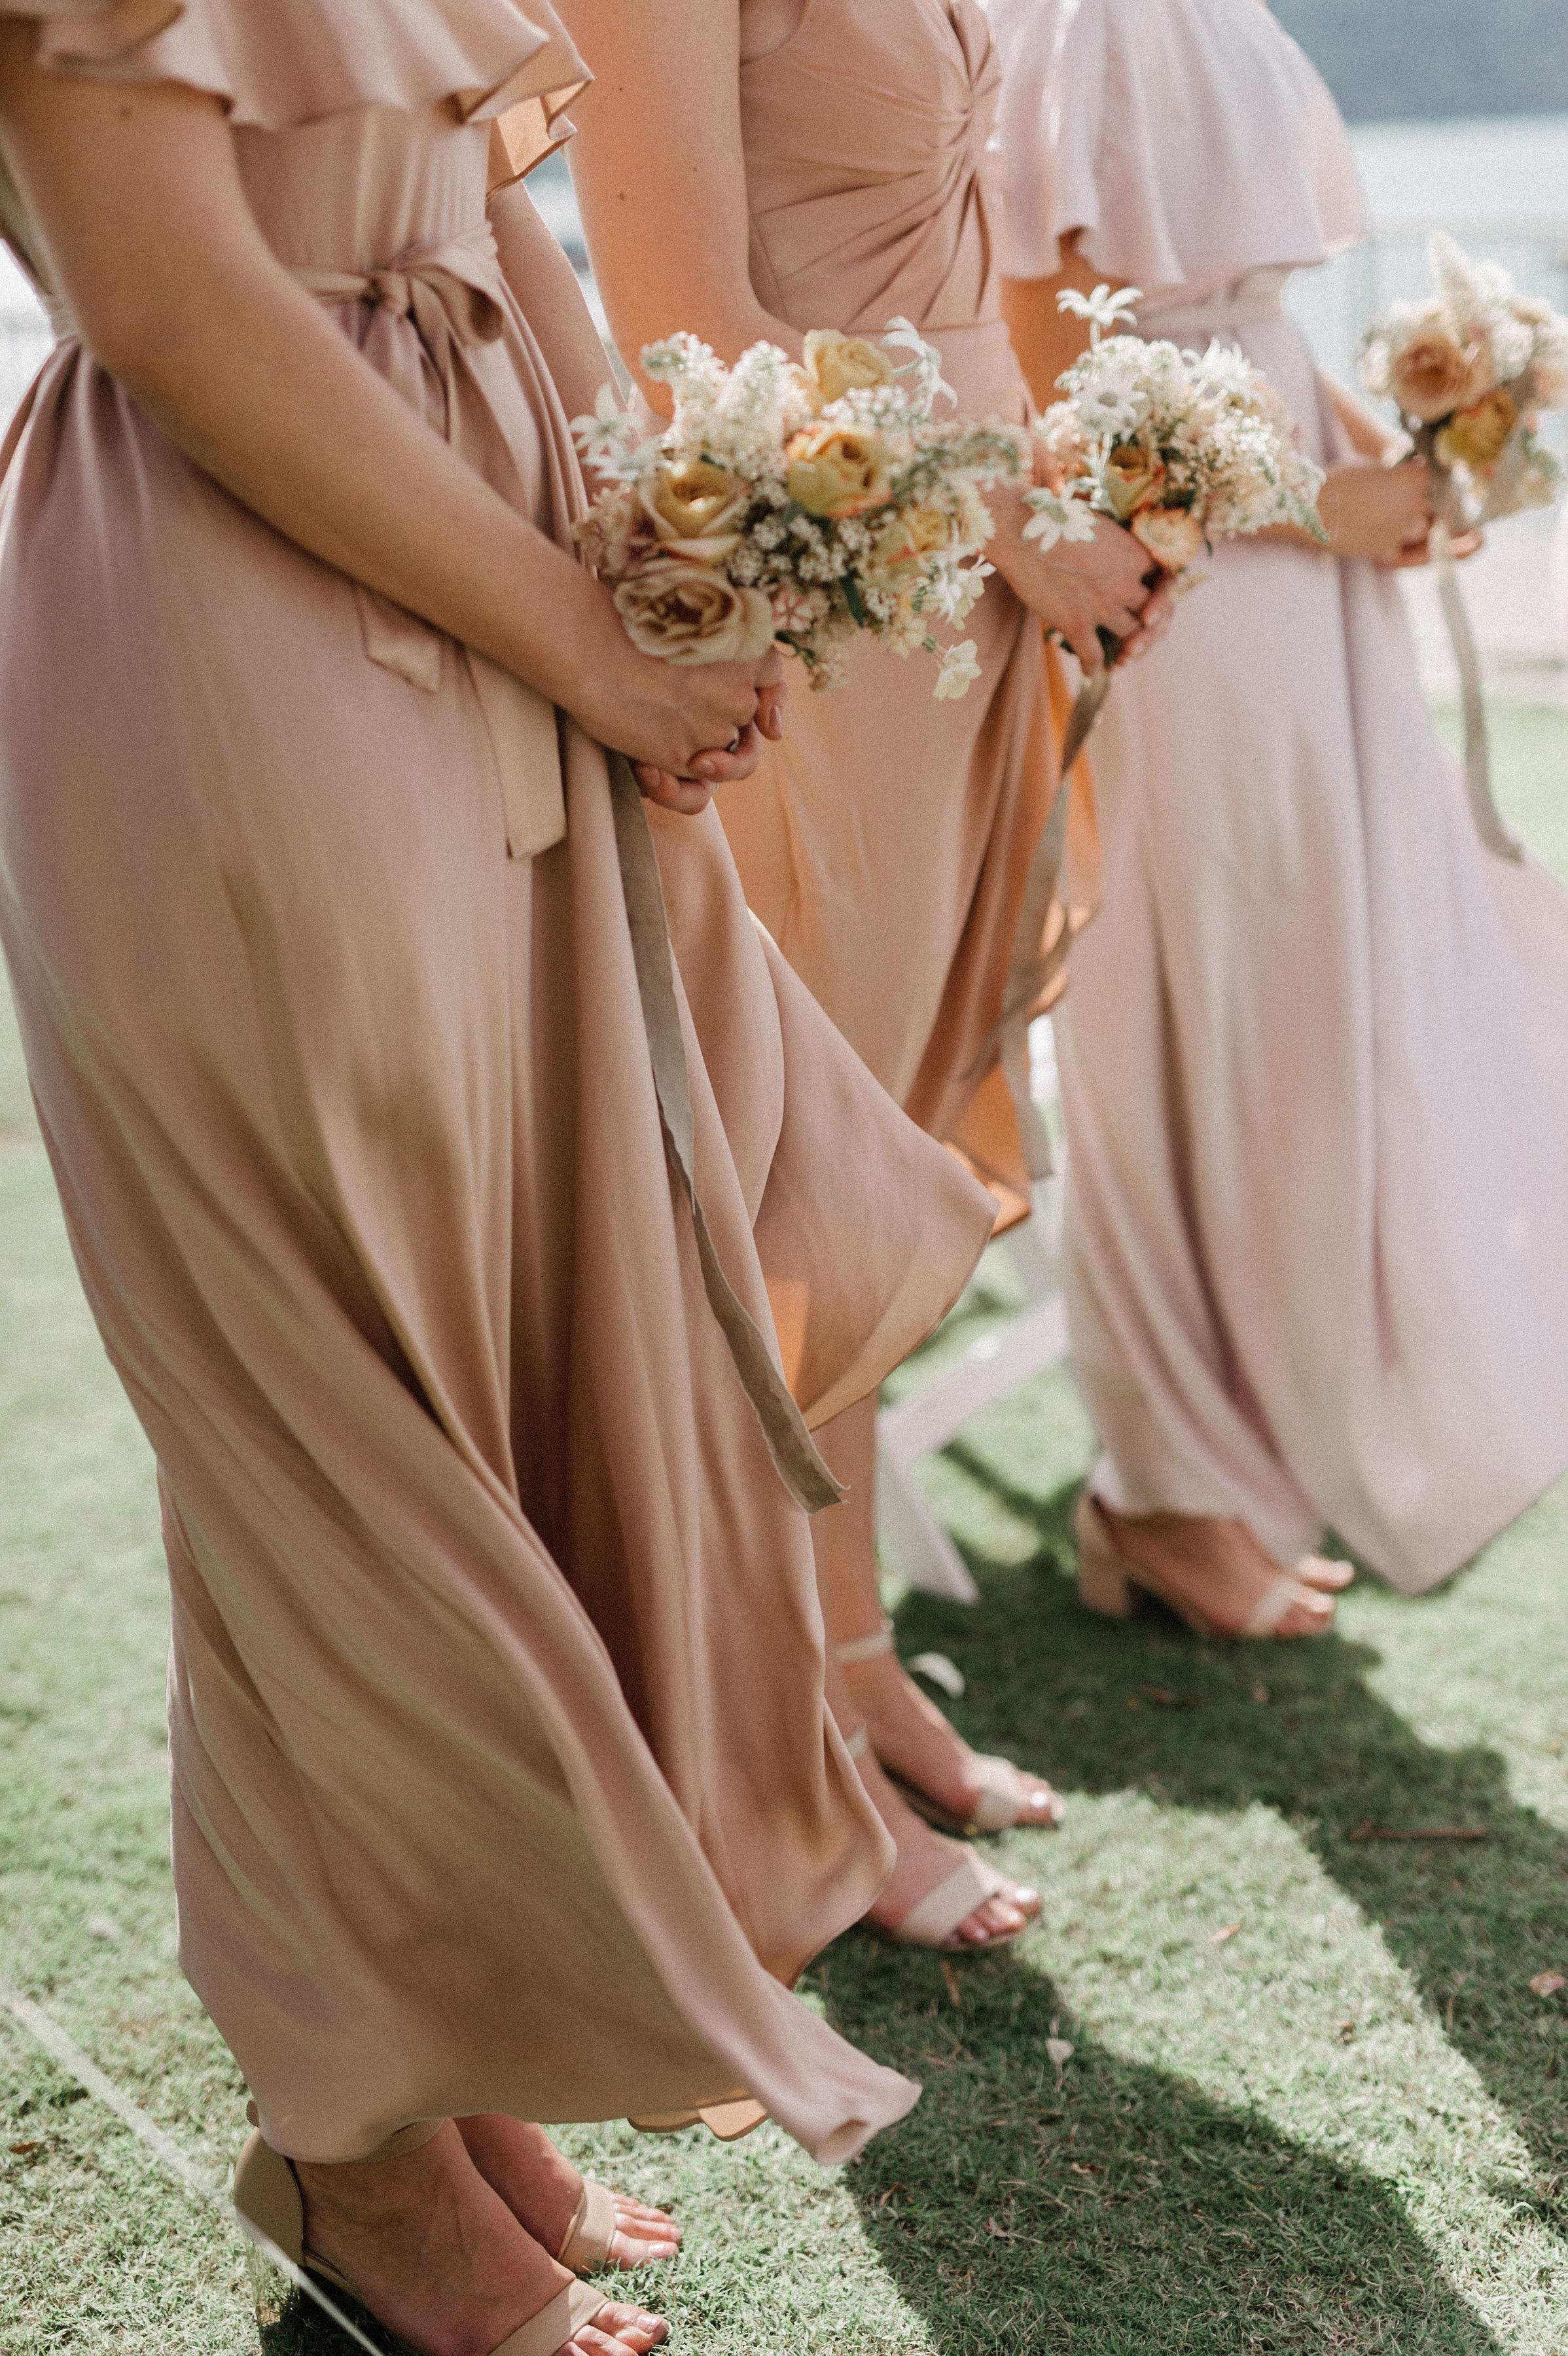 sydney beach wedding. textural and romantic wedding flowers. blush bridesmaid's bouquets